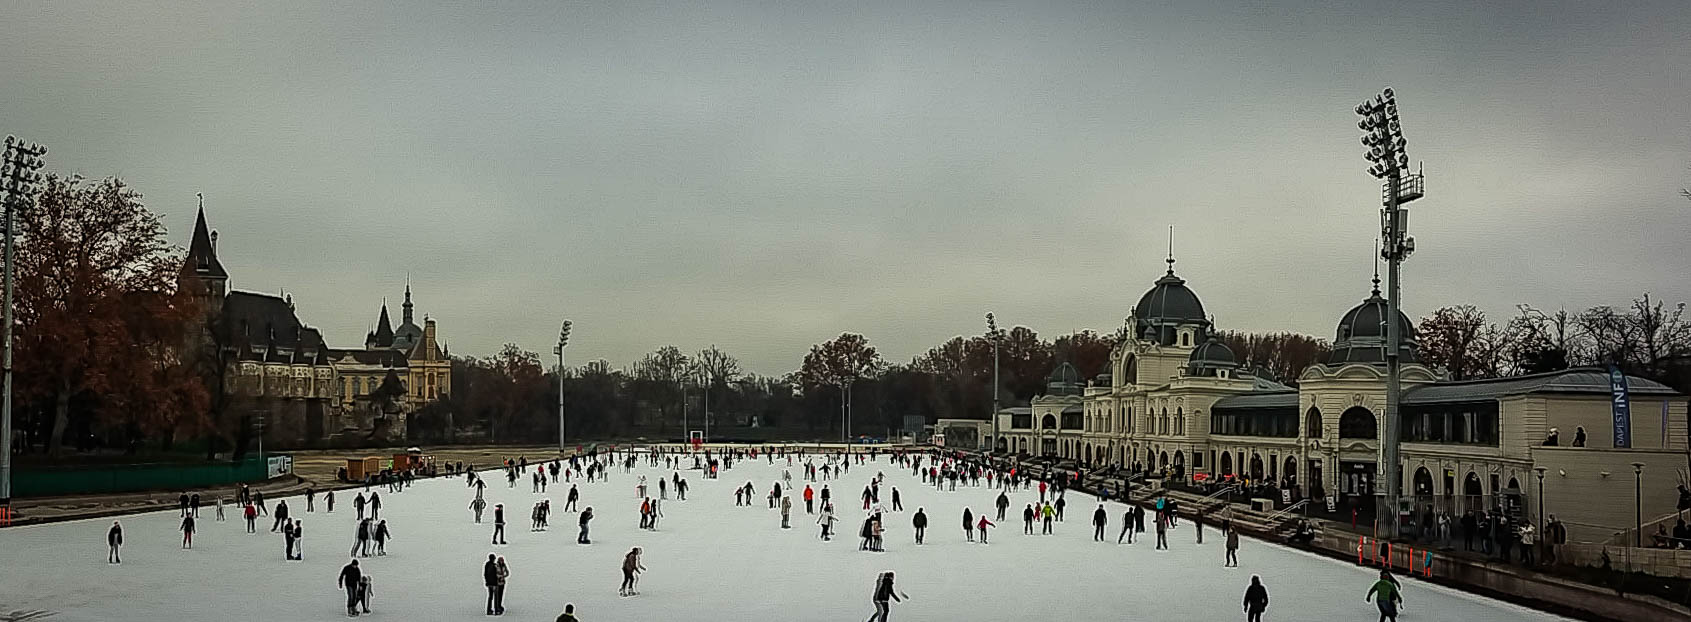 ice skating central park Budapest